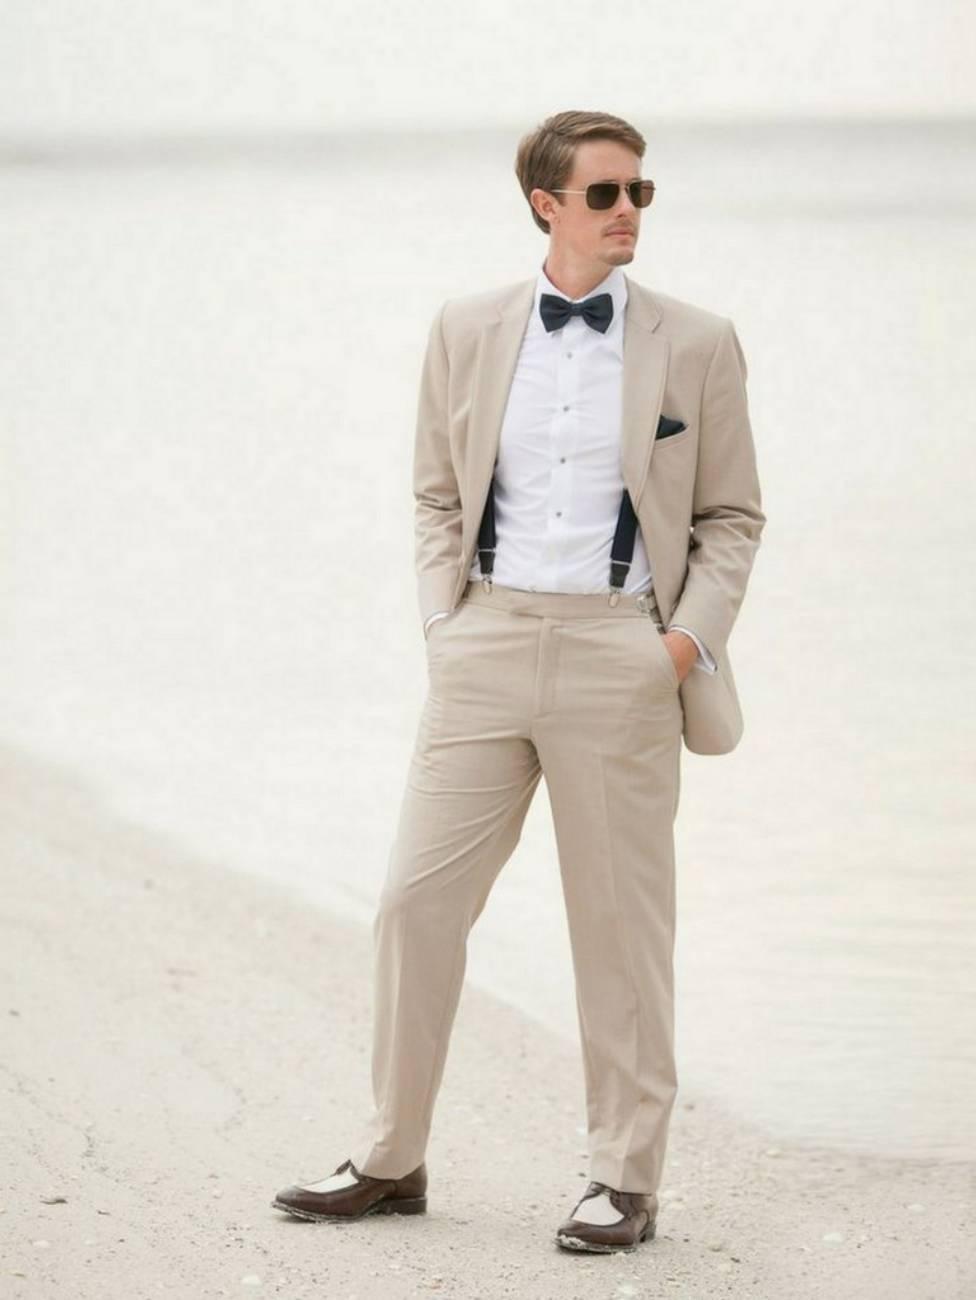 Latest Coat Pant Designs Beige Causal Wedding Suits For Man Custom Beach Slim Fit Bridegroom 2 Pieces Tuxedo Jacket+Pants 195